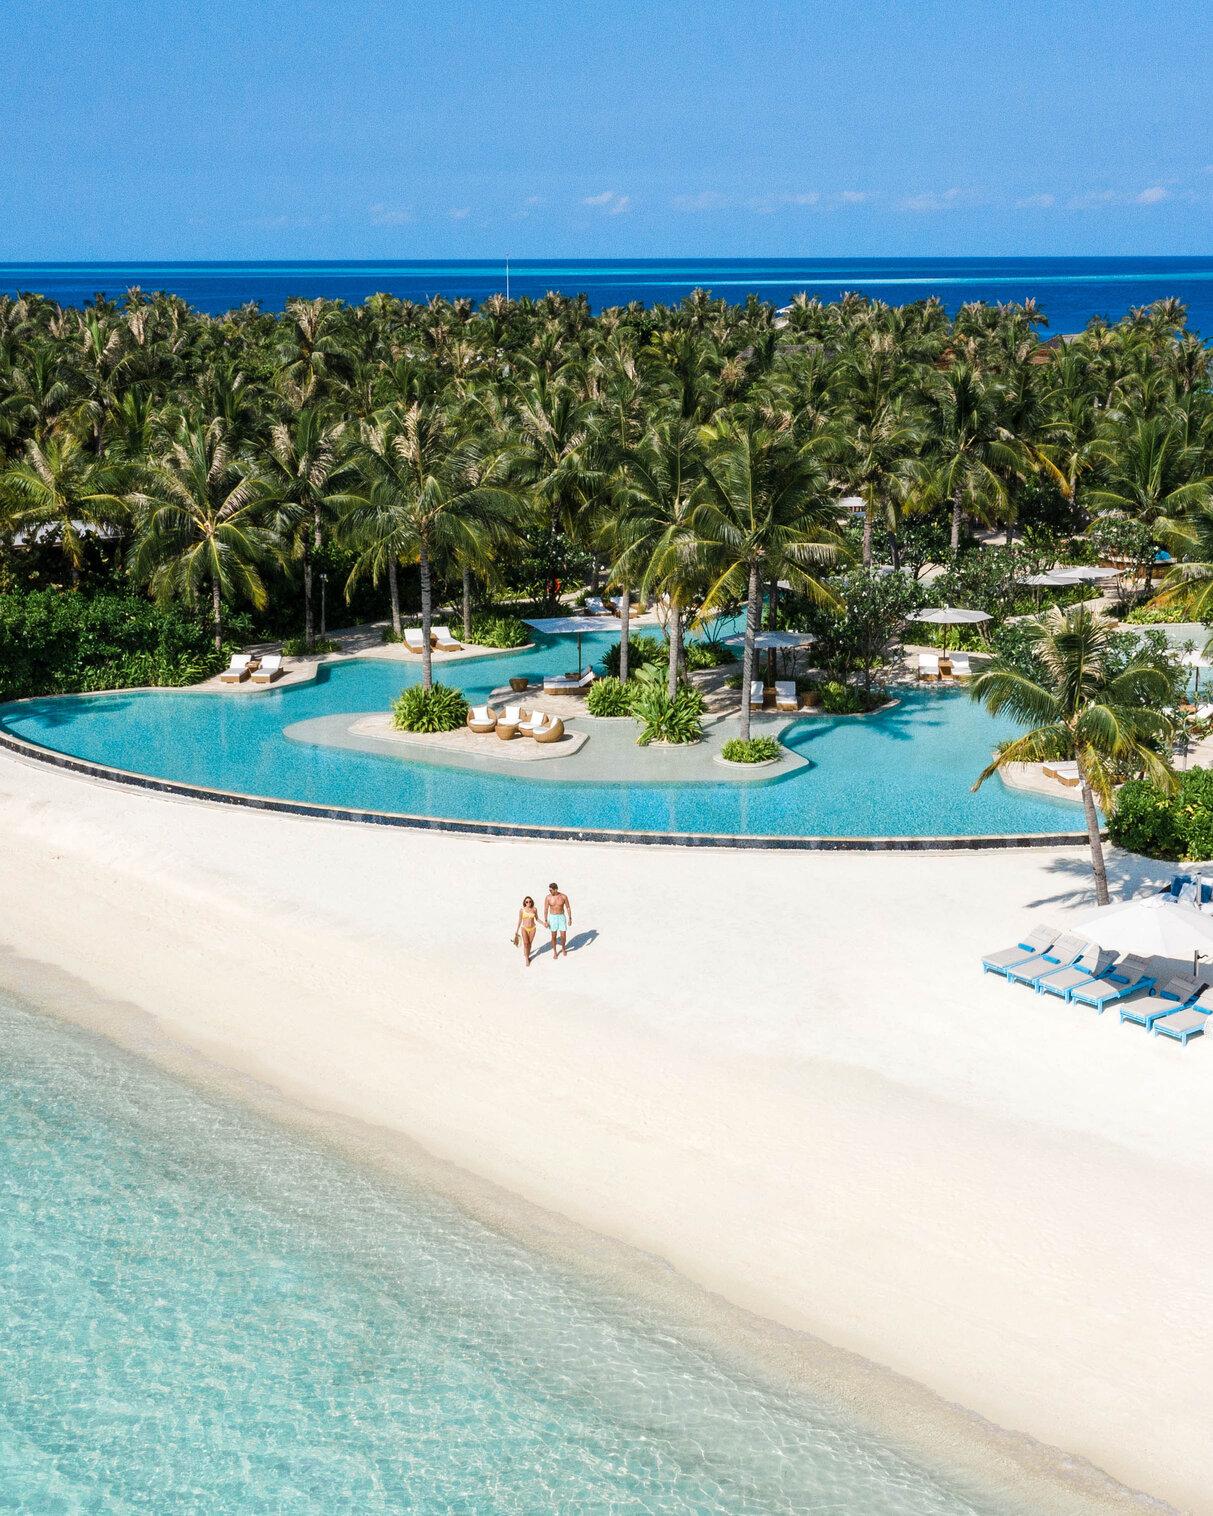 Waldorf Astoria Maldives Ithaafushi- A Culinary Journey in the Ultimate Island Paradise